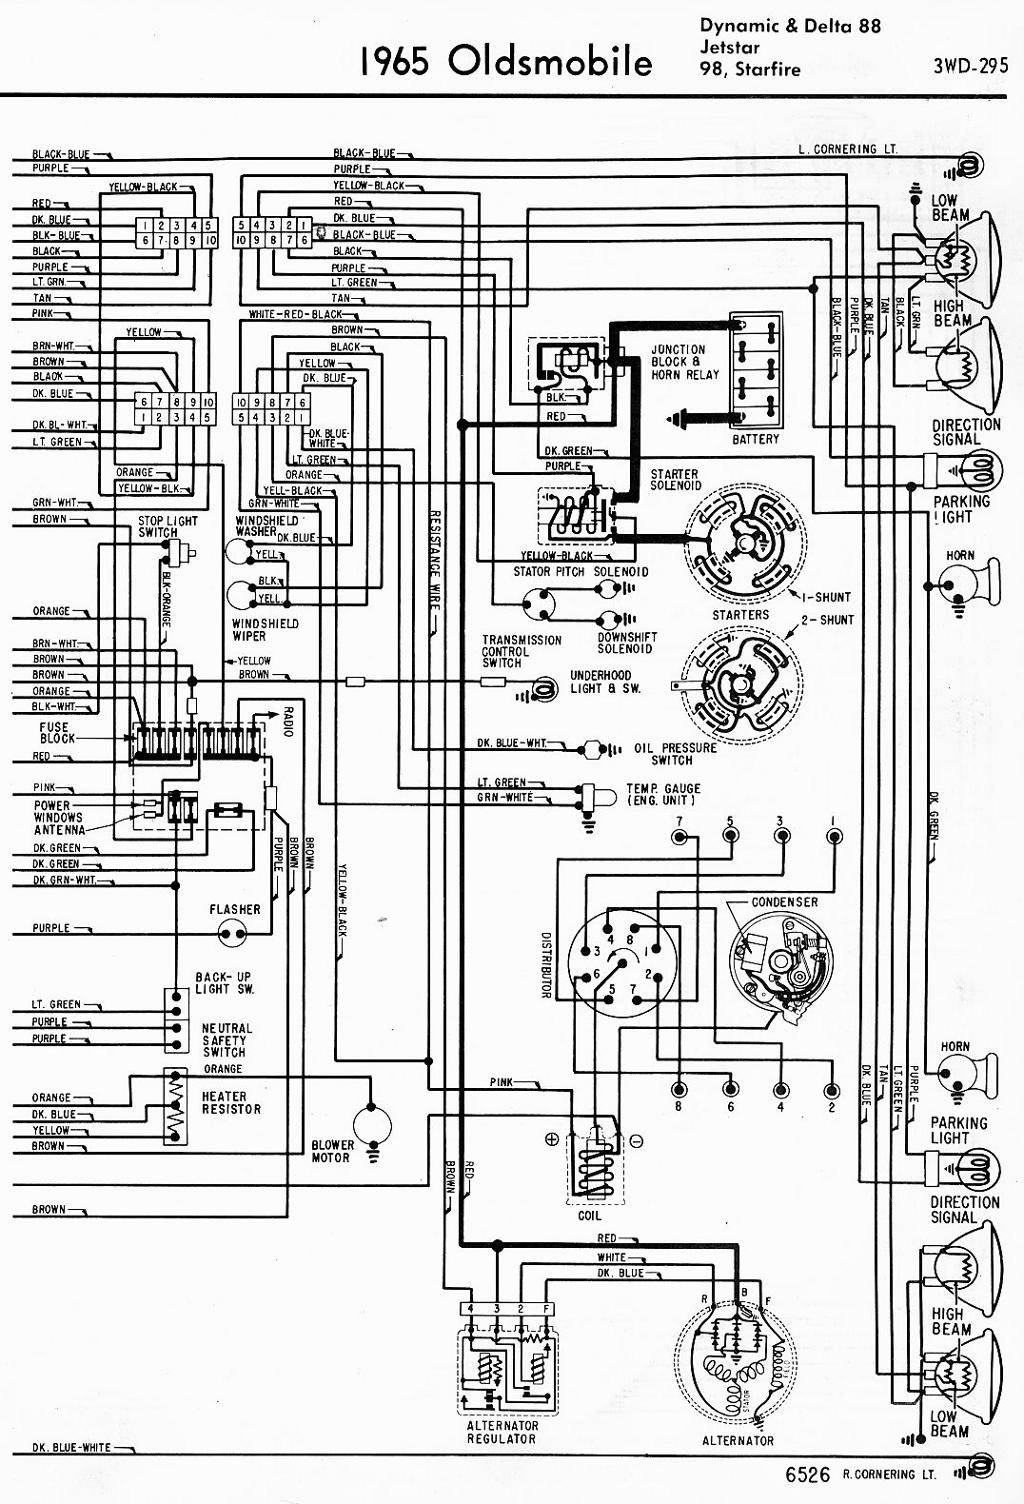 Wiring Diagram Nissan Vanette : Nissan serena fuse box location temp sensor wiring